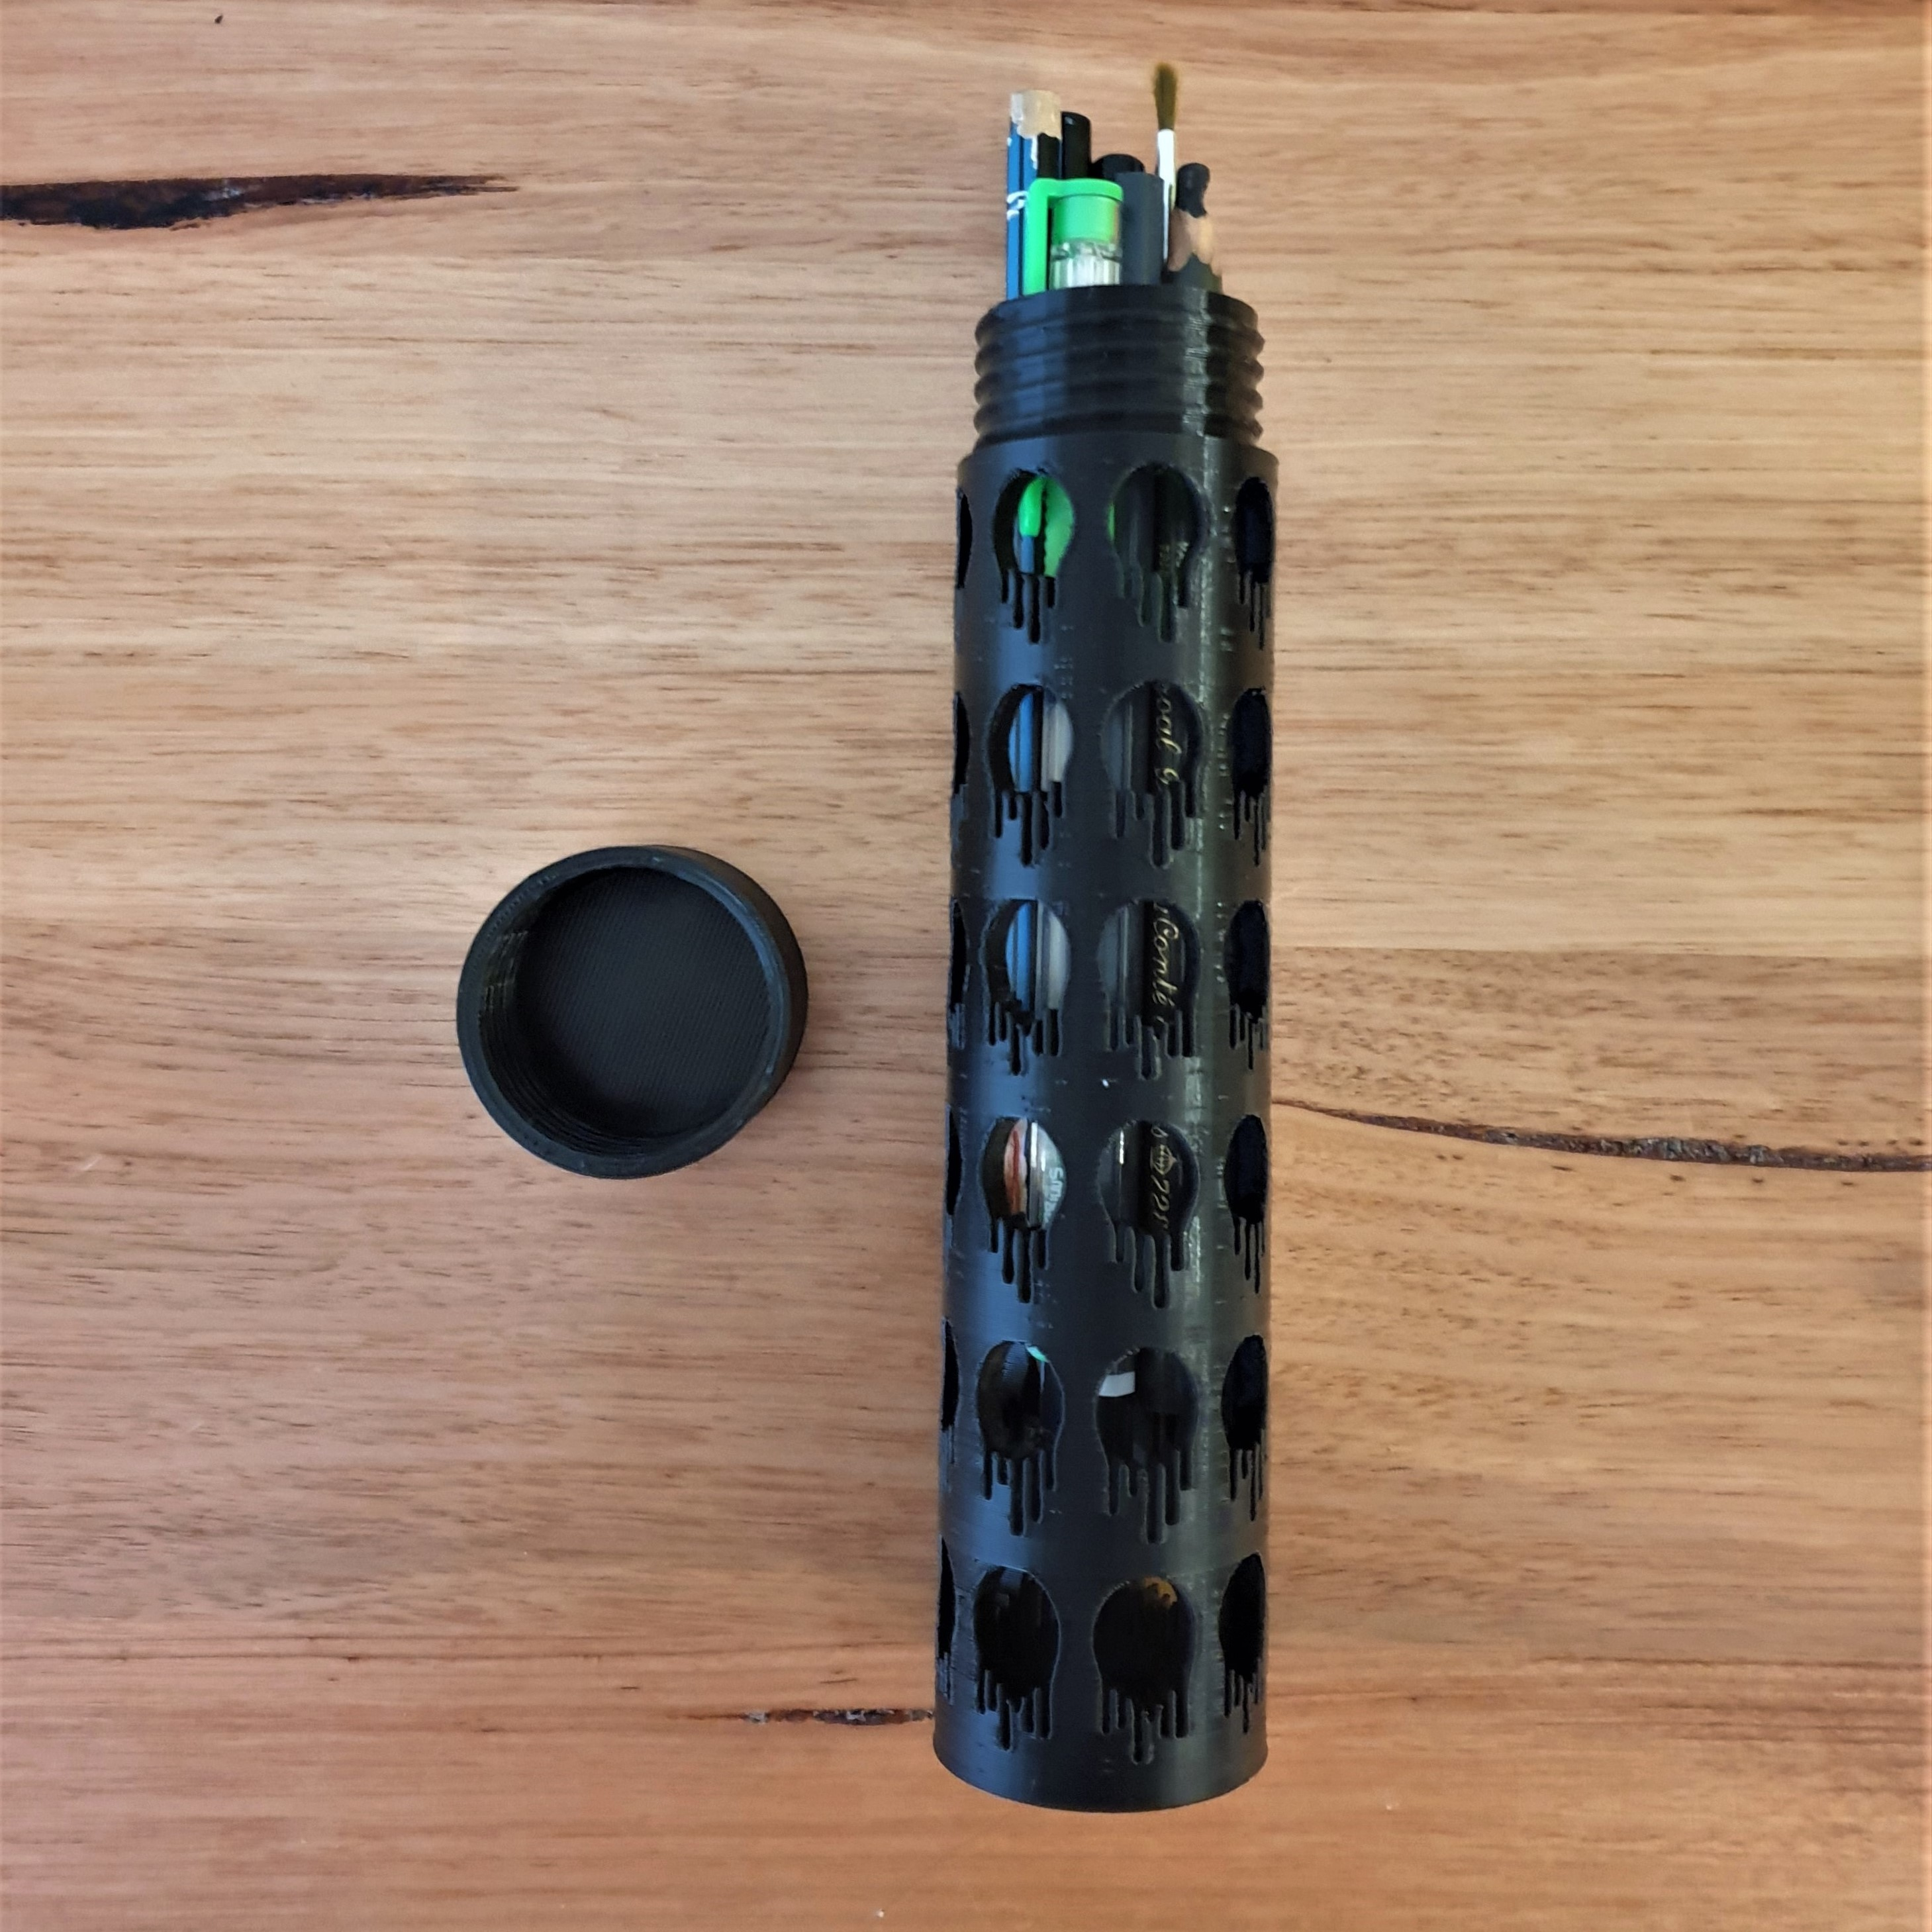 ccc20200726_074412.jpg Download free STL file Drips pencil case box screw top • 3D printing object, CheesmondN